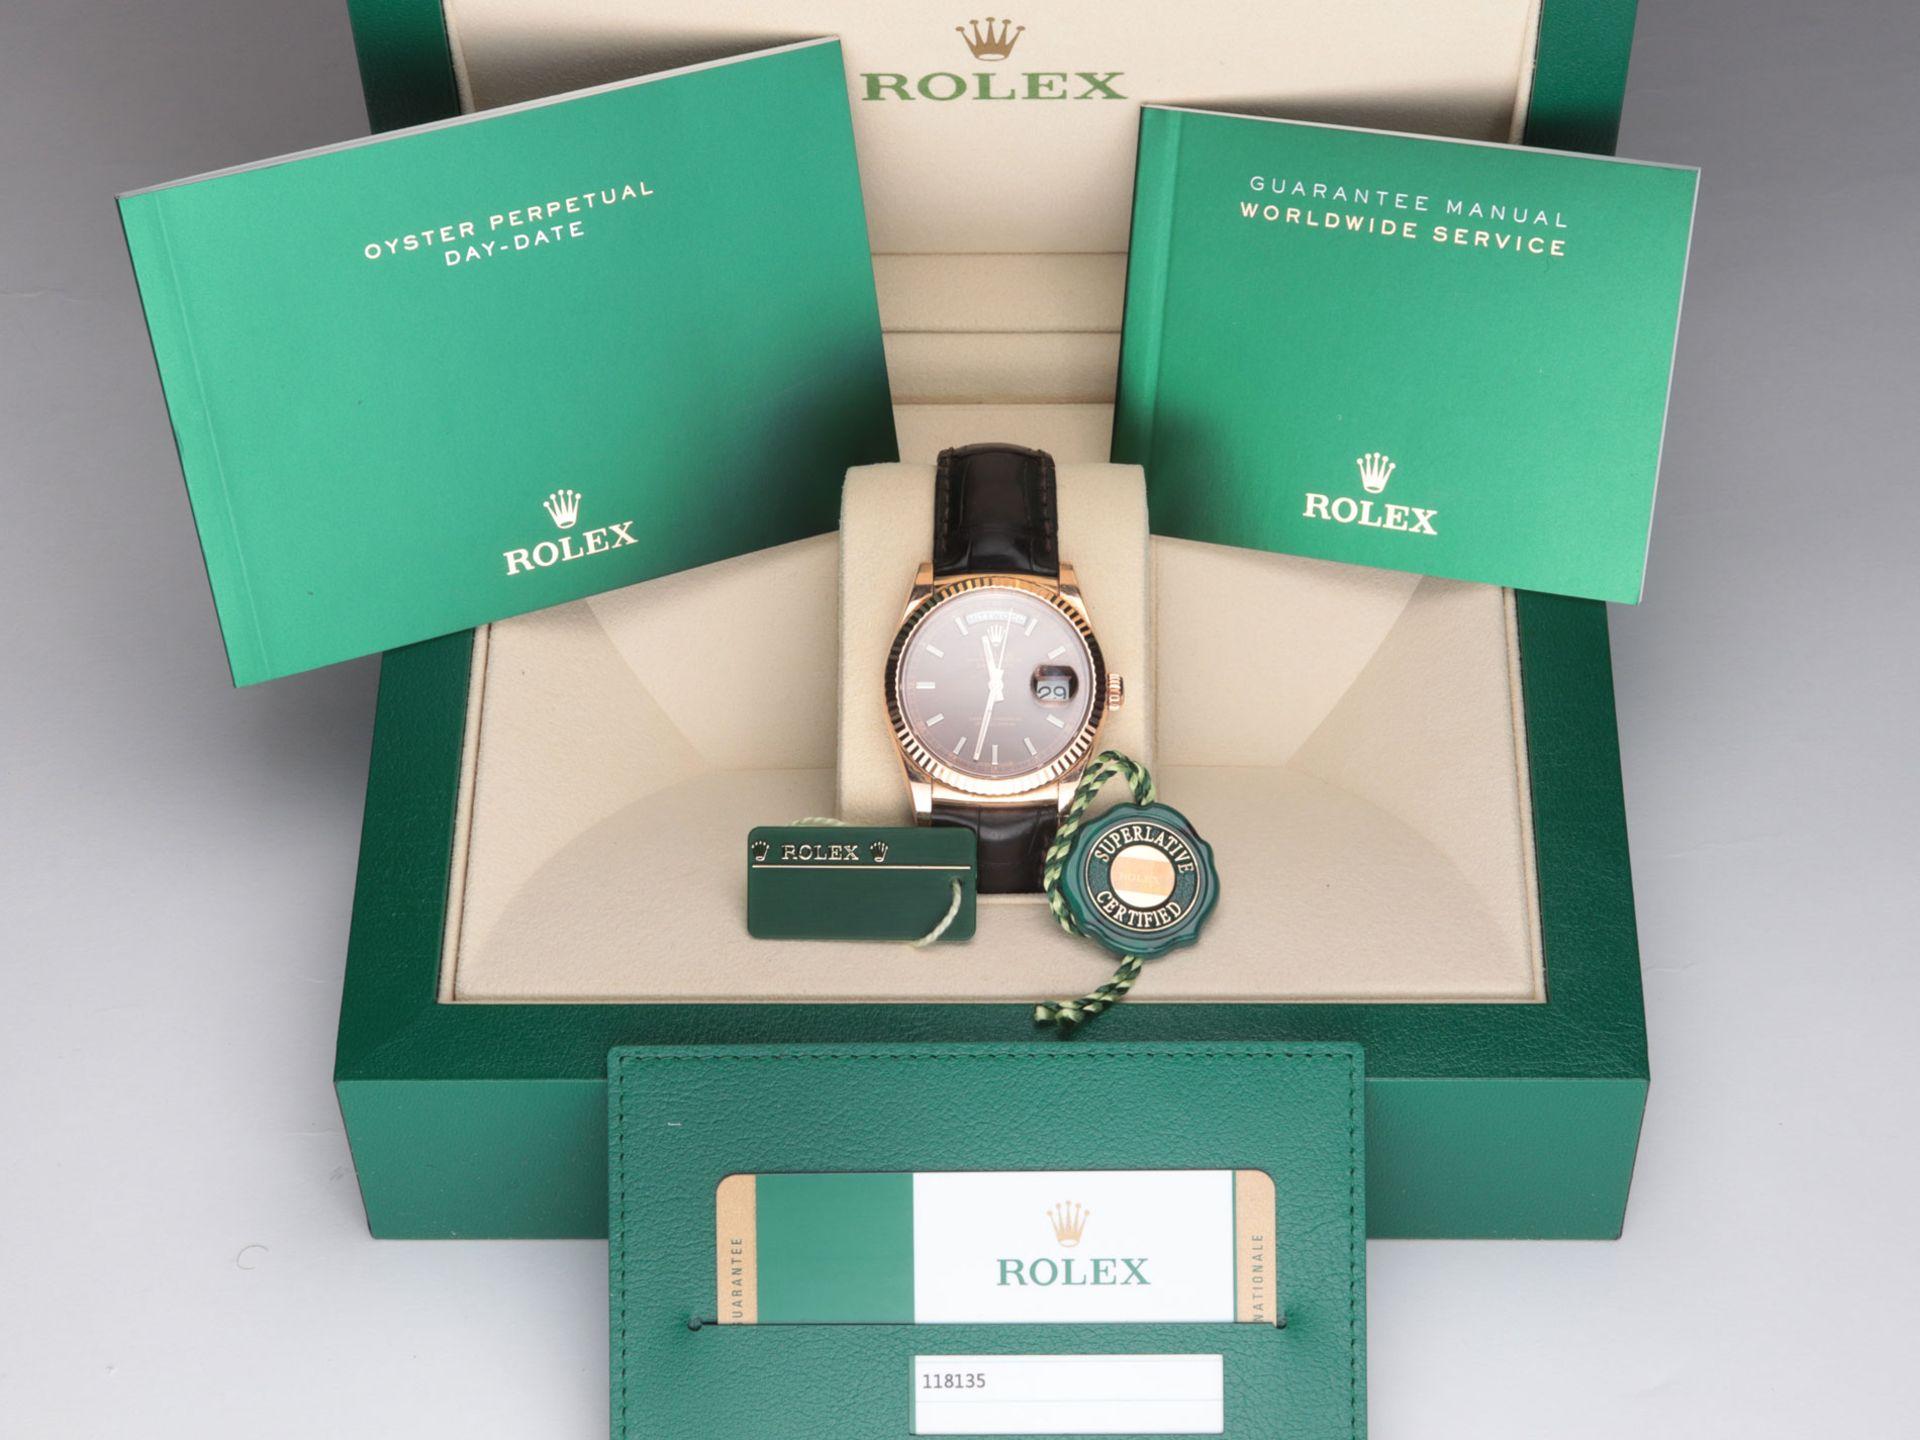 Rolex - Herrenarmbanduhr Roségold 750, Rolex Day-Date Oyster Perpetual, Superlative C - Image 2 of 17